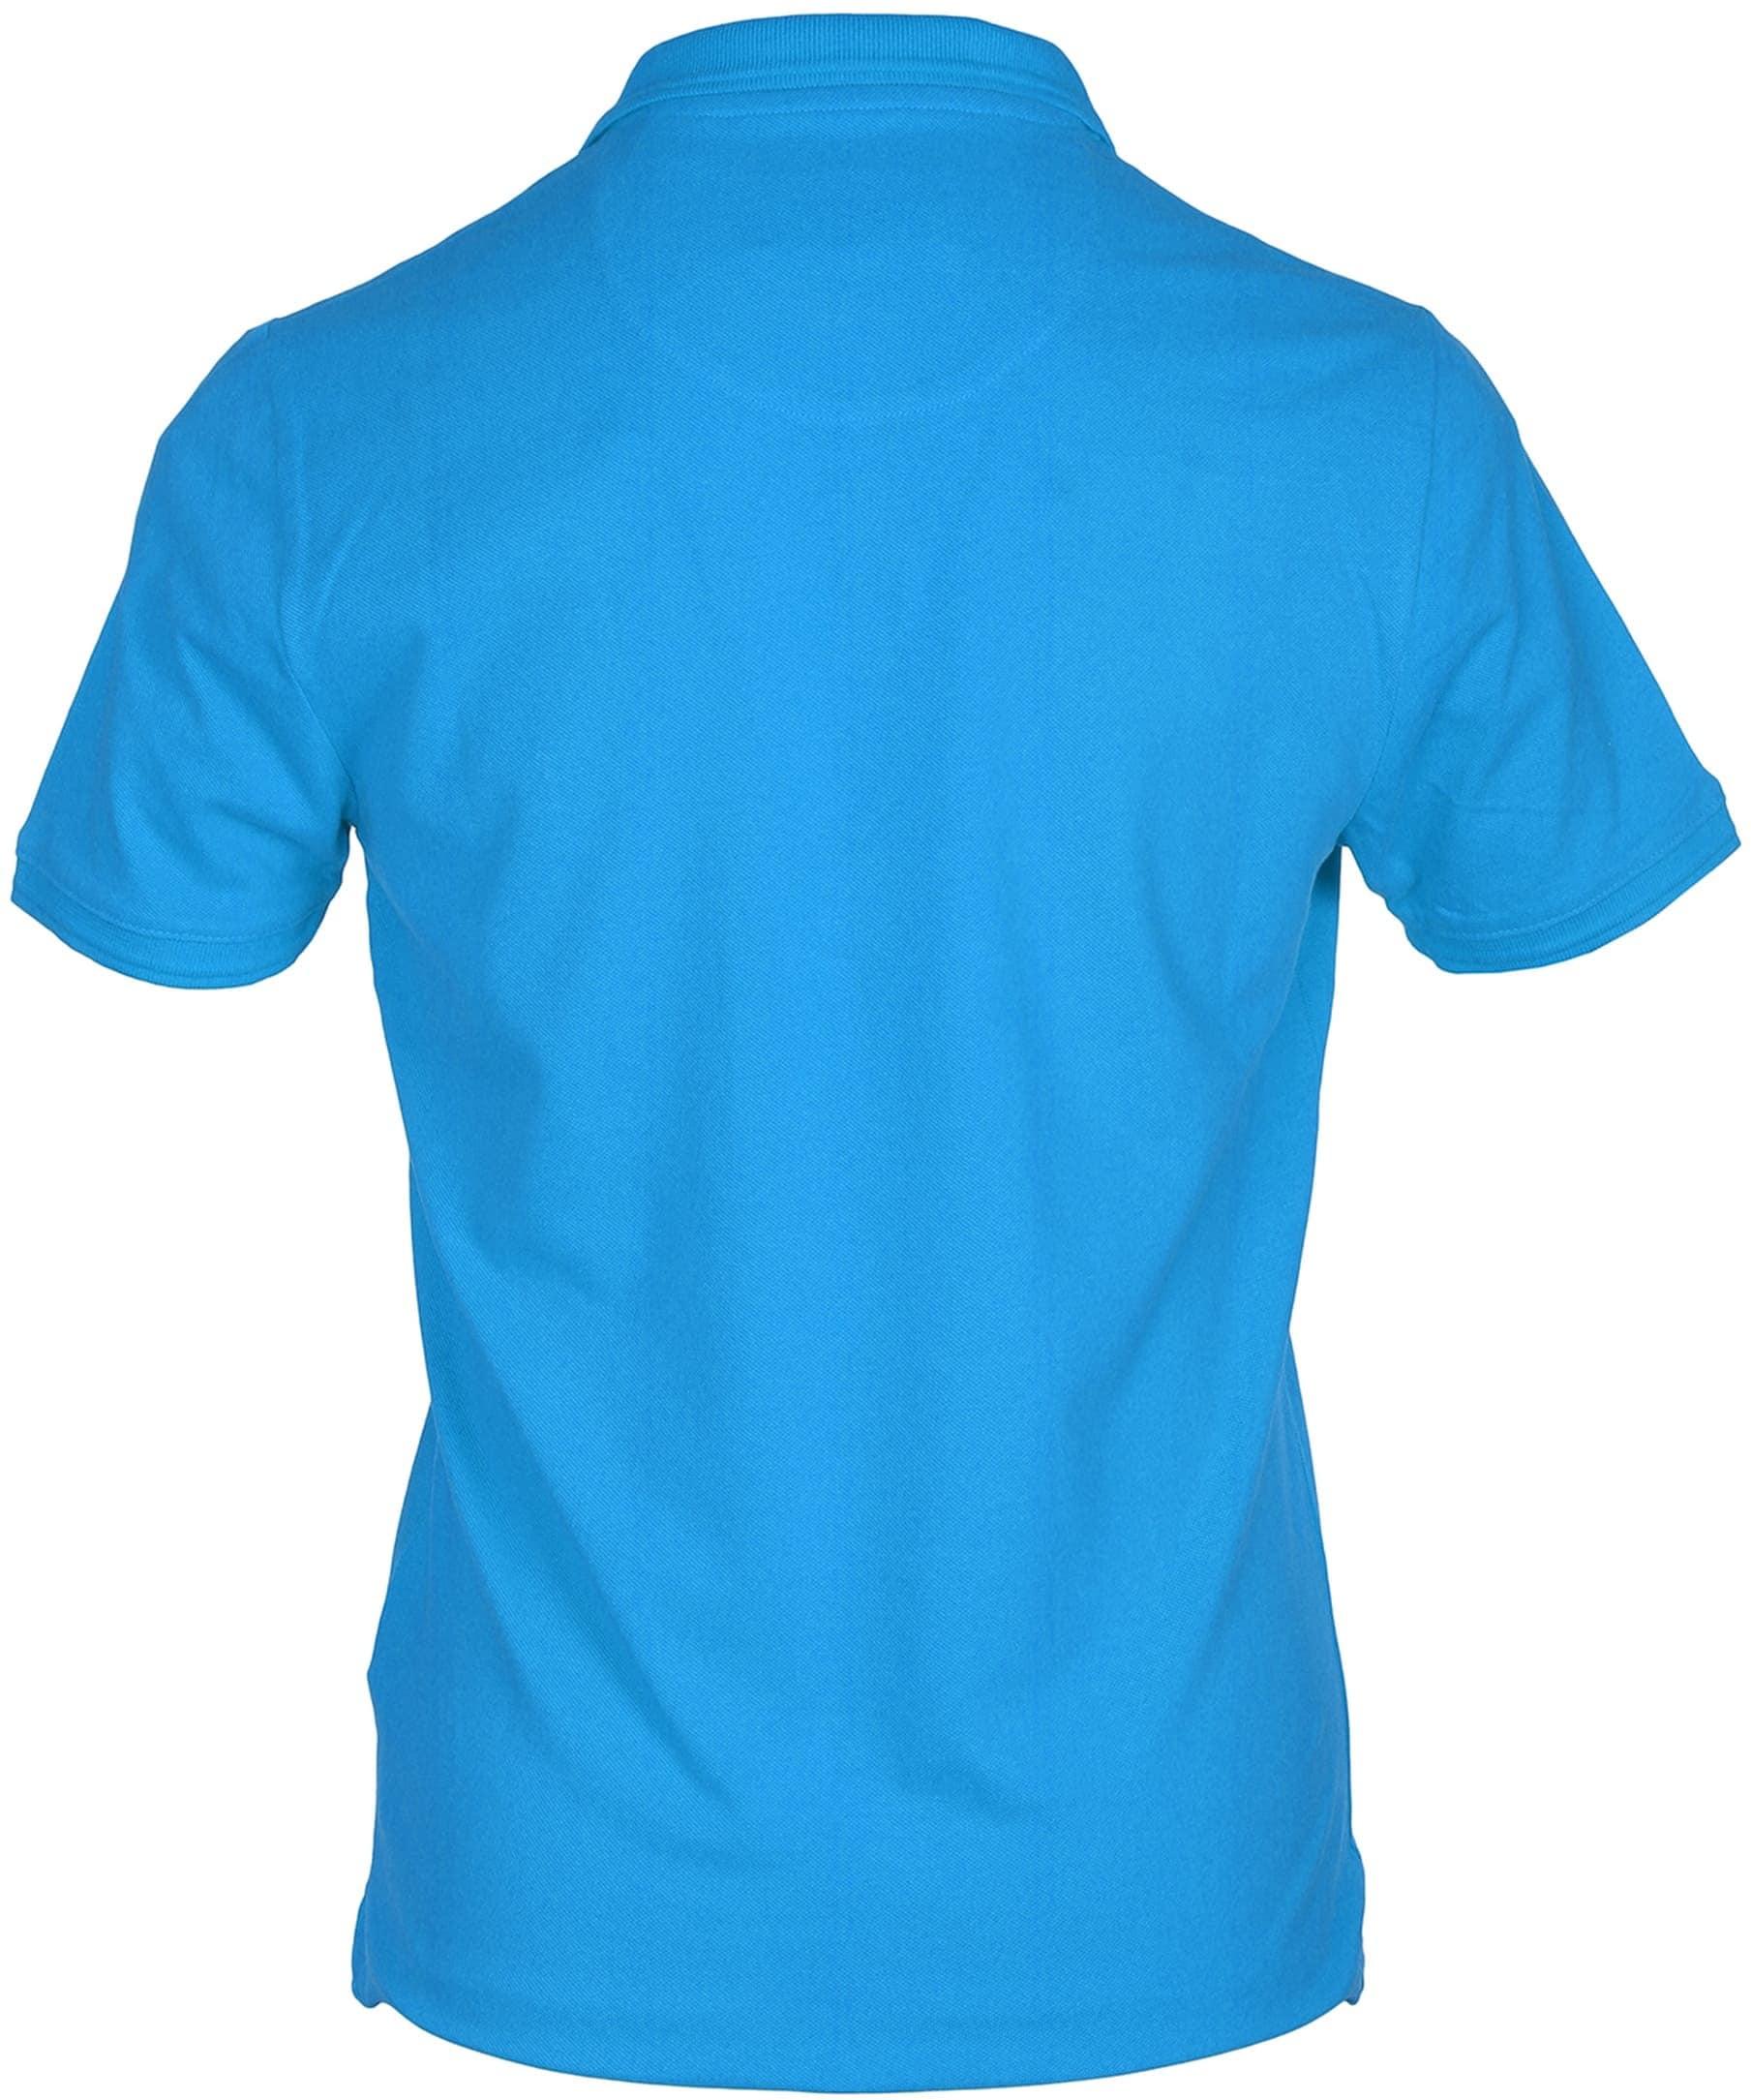 Original Penguin Poloshirt Blau foto 2